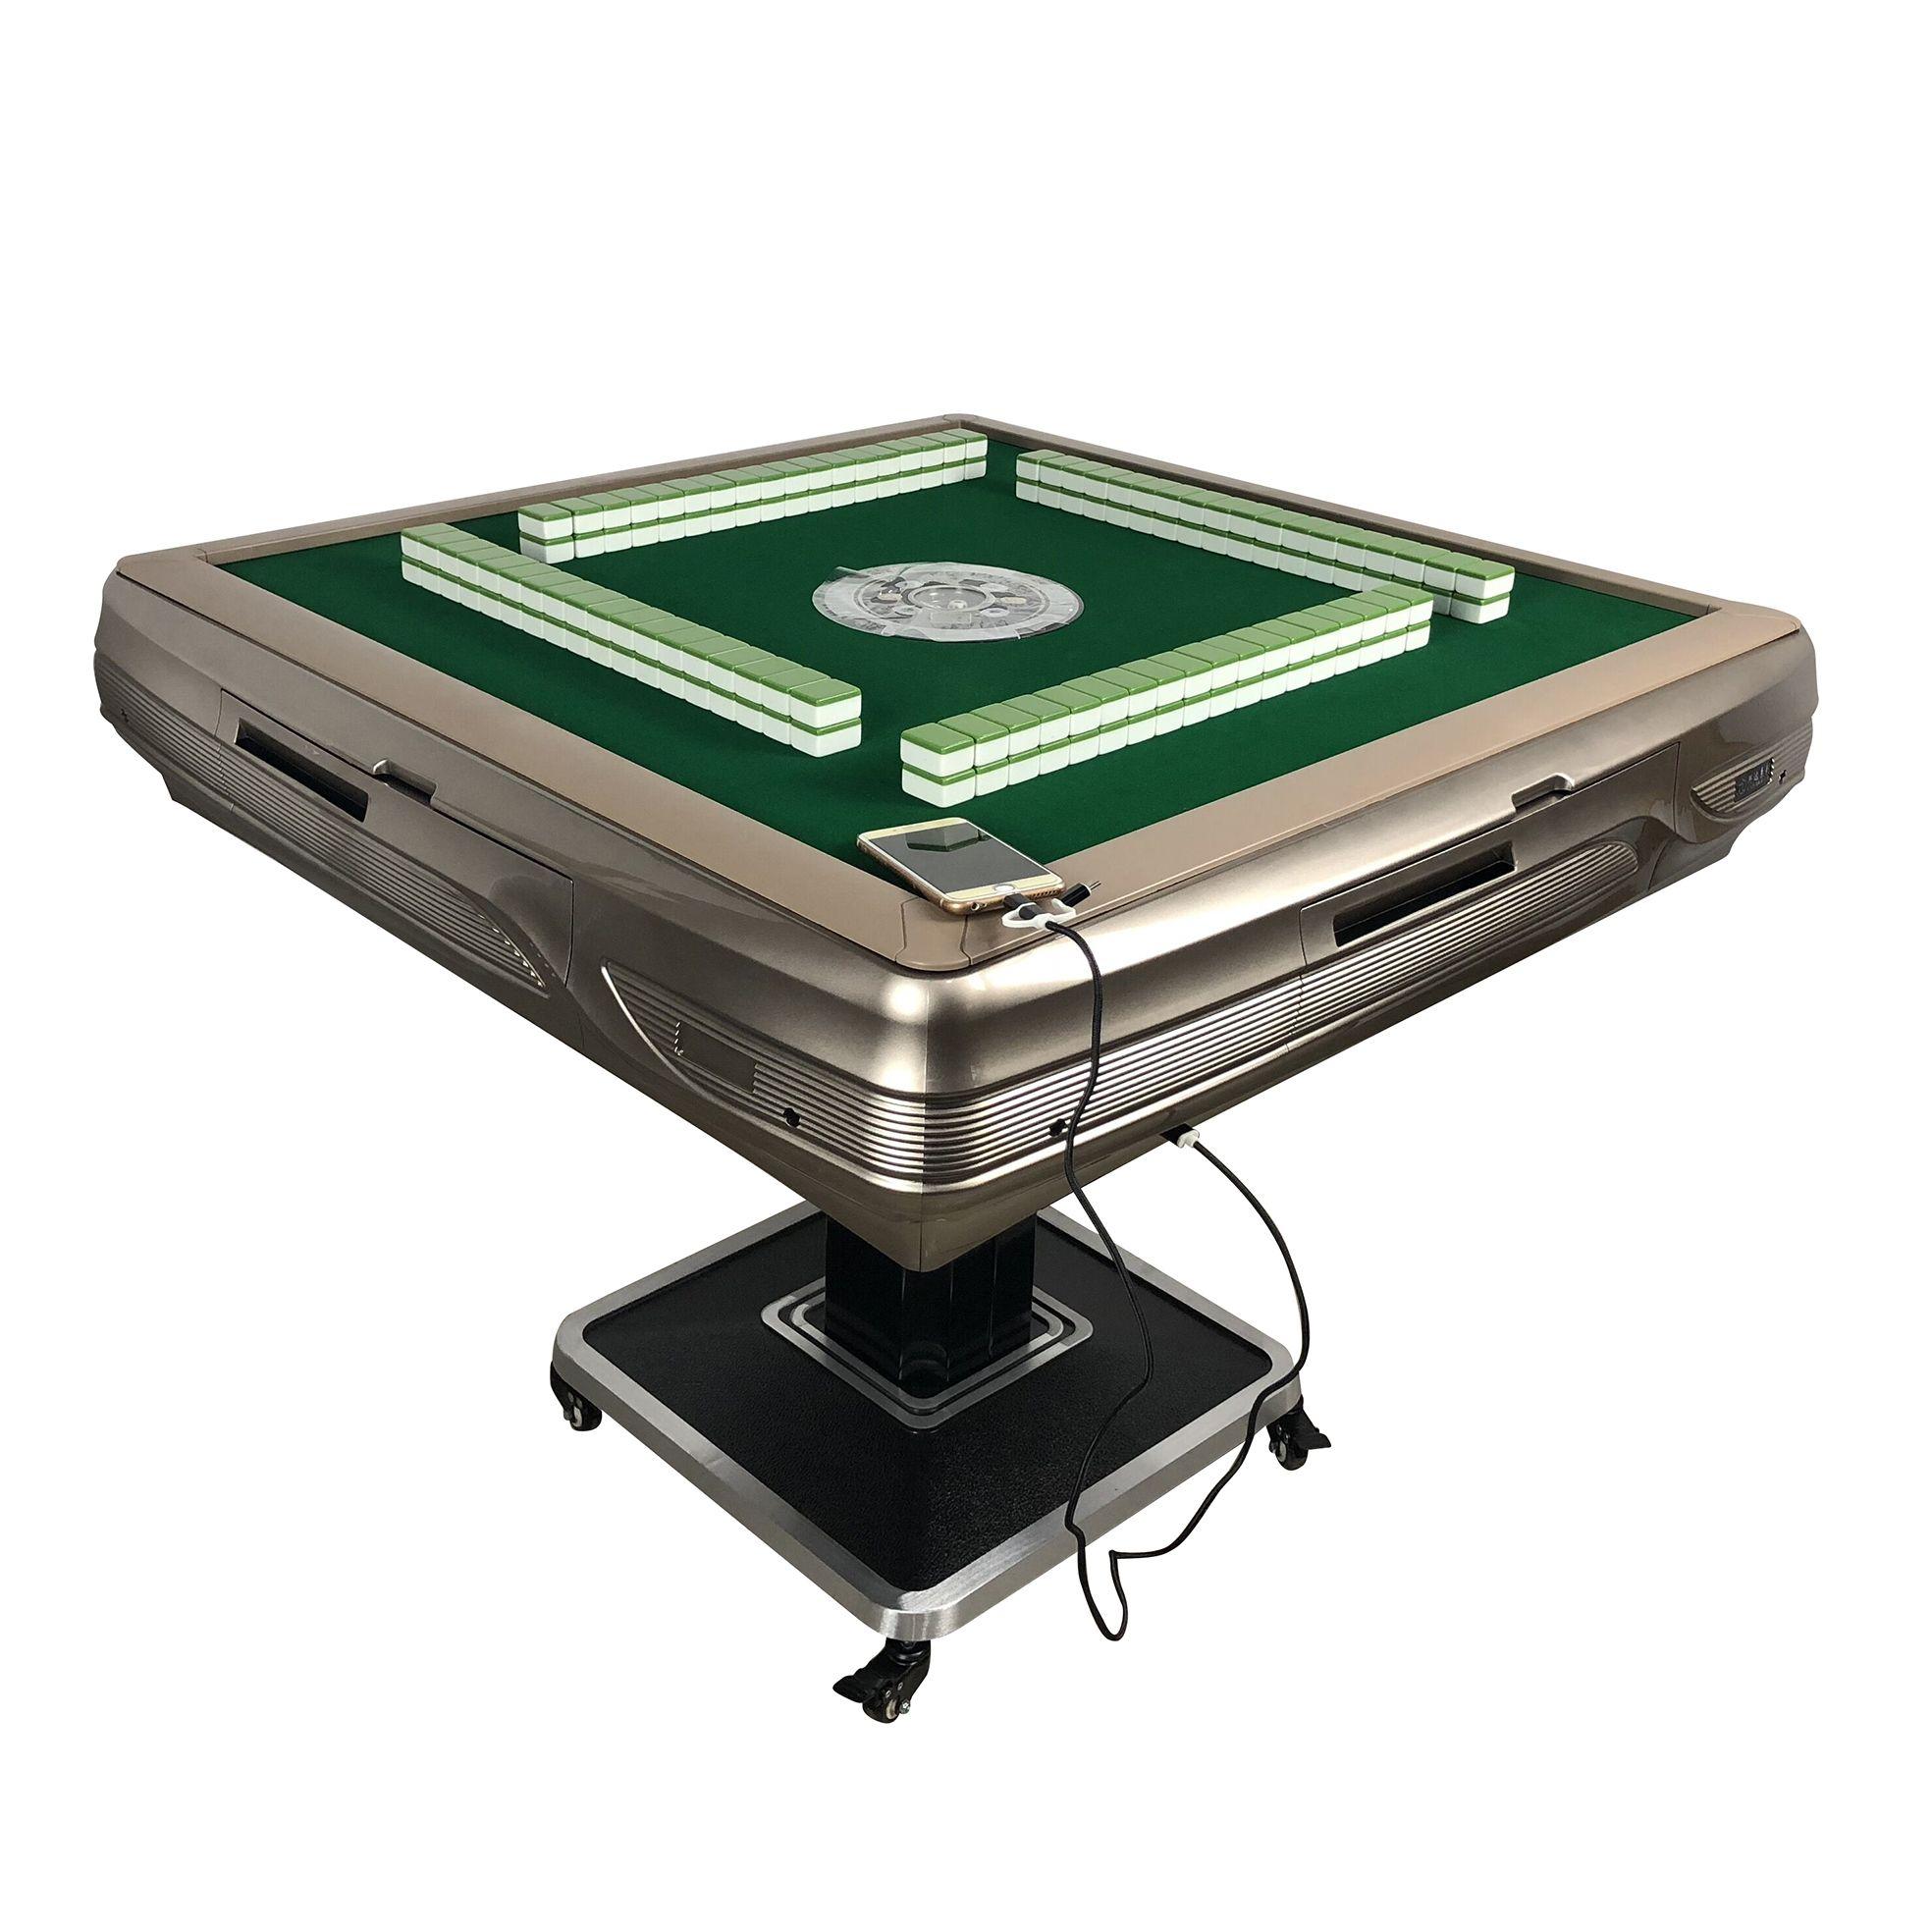 2021 Zeitbegrenzte Top Mode Jogo de xadrez Schachuhr Schach Set Faltbare automatische Mahjong-Tabelle